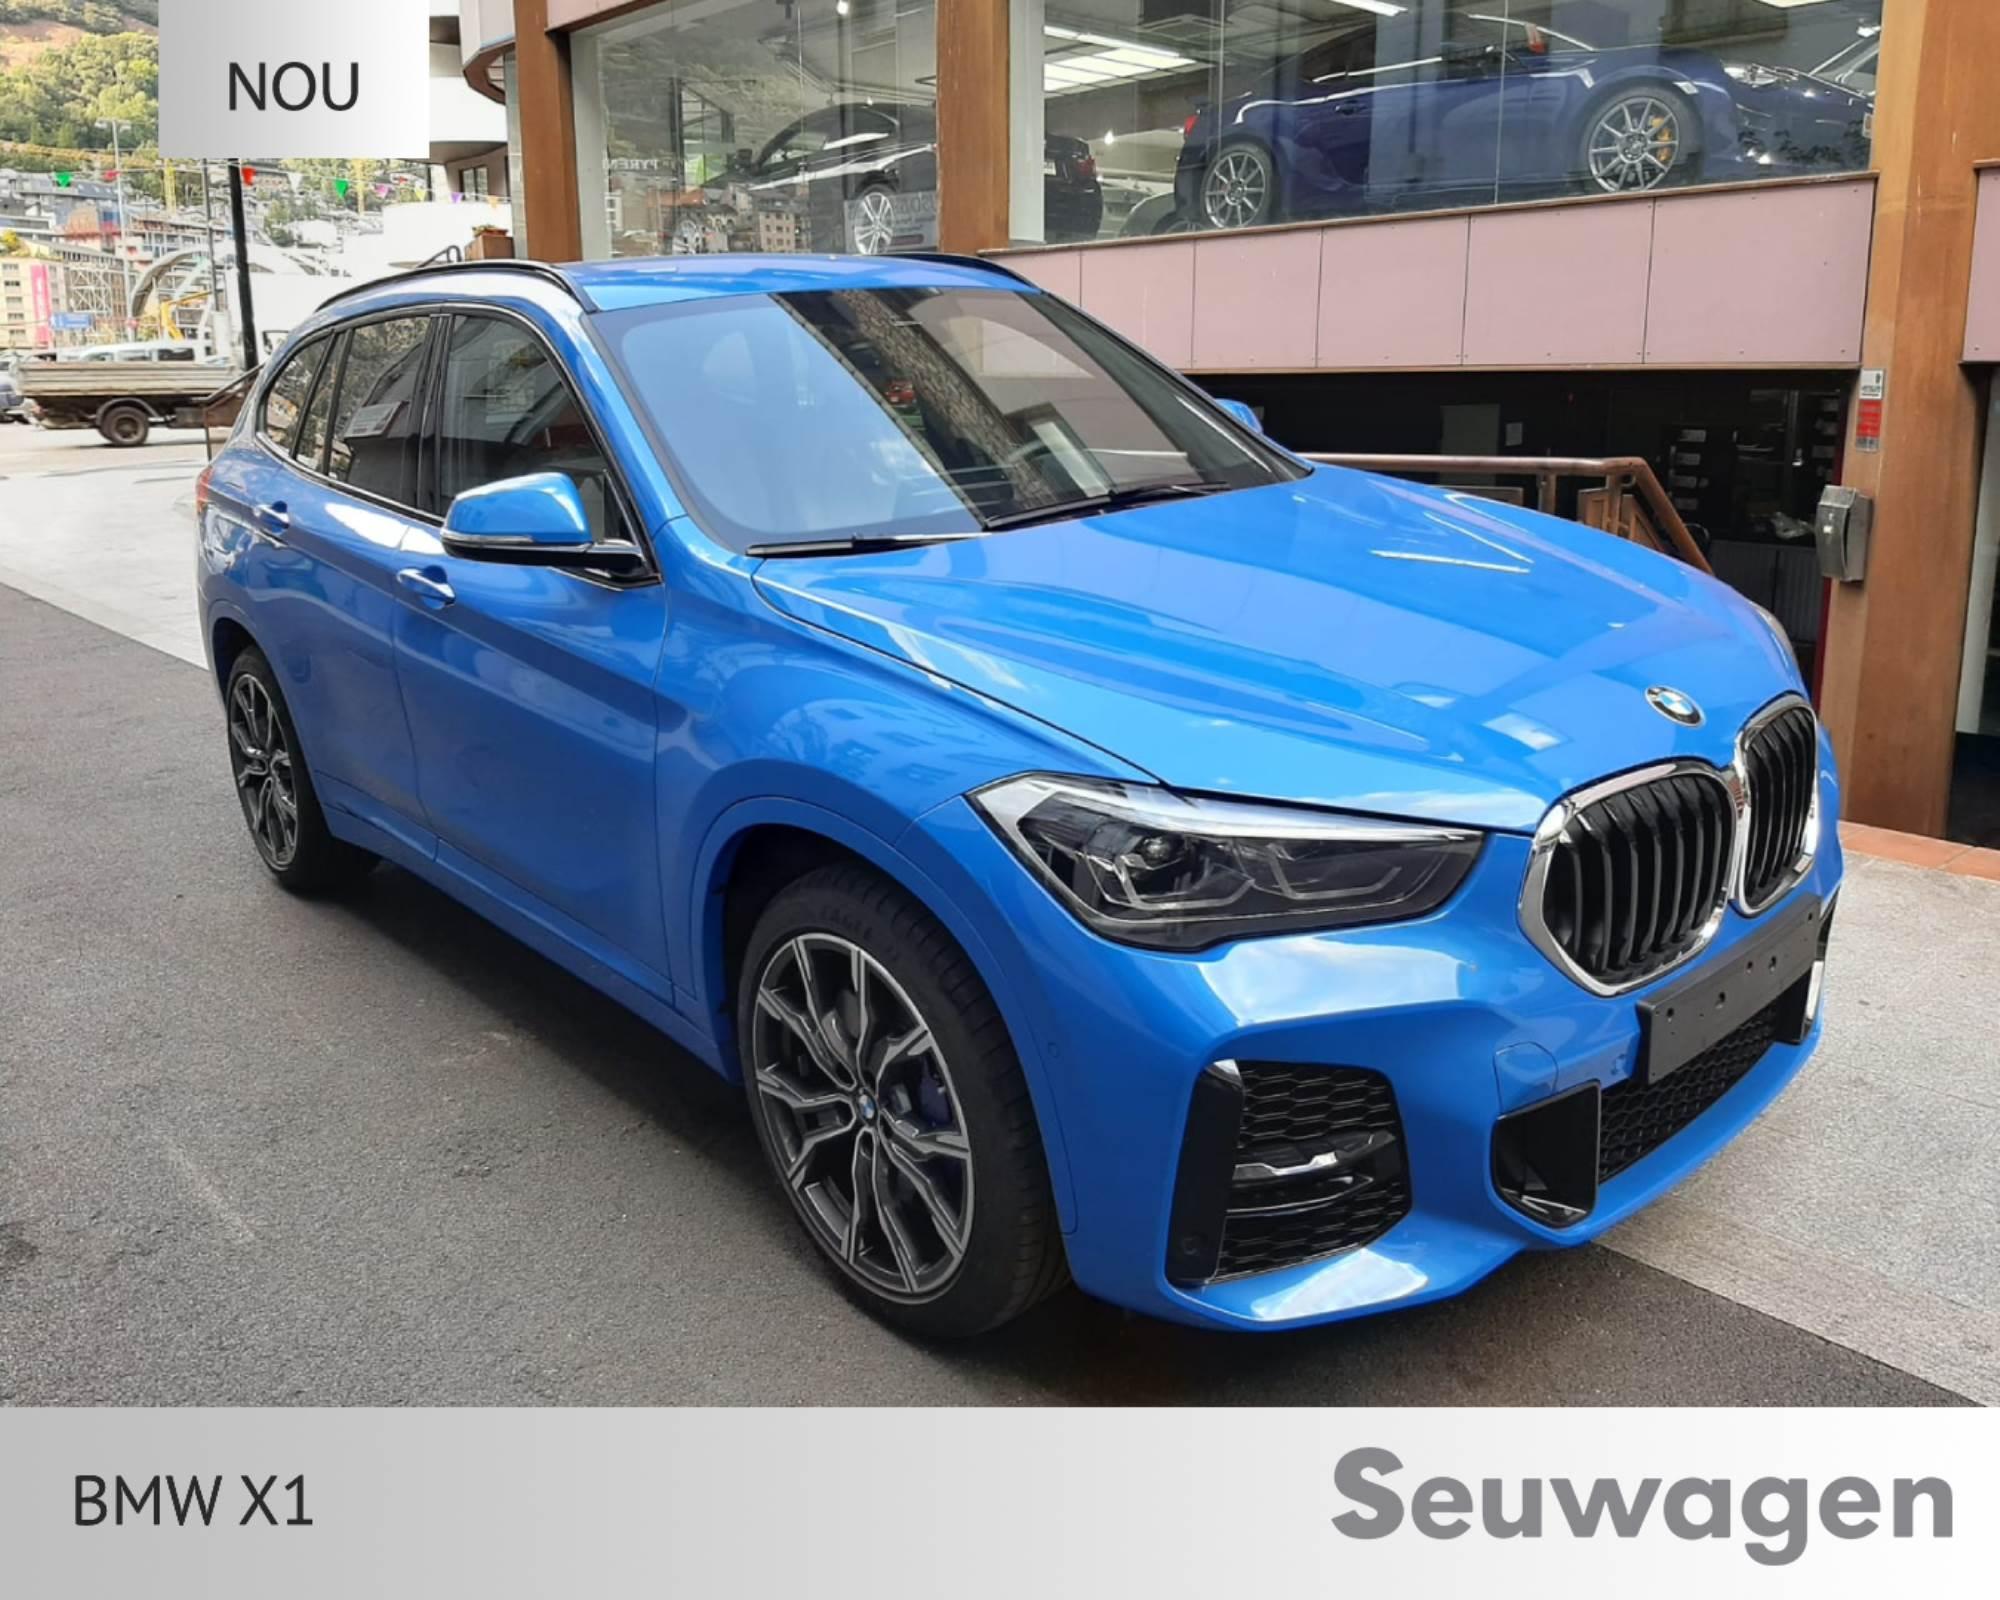 BMW - X1 - XDRIVE 25 I 232CV XDRIVE 25 I 232CV Benzina  2021  00 Km